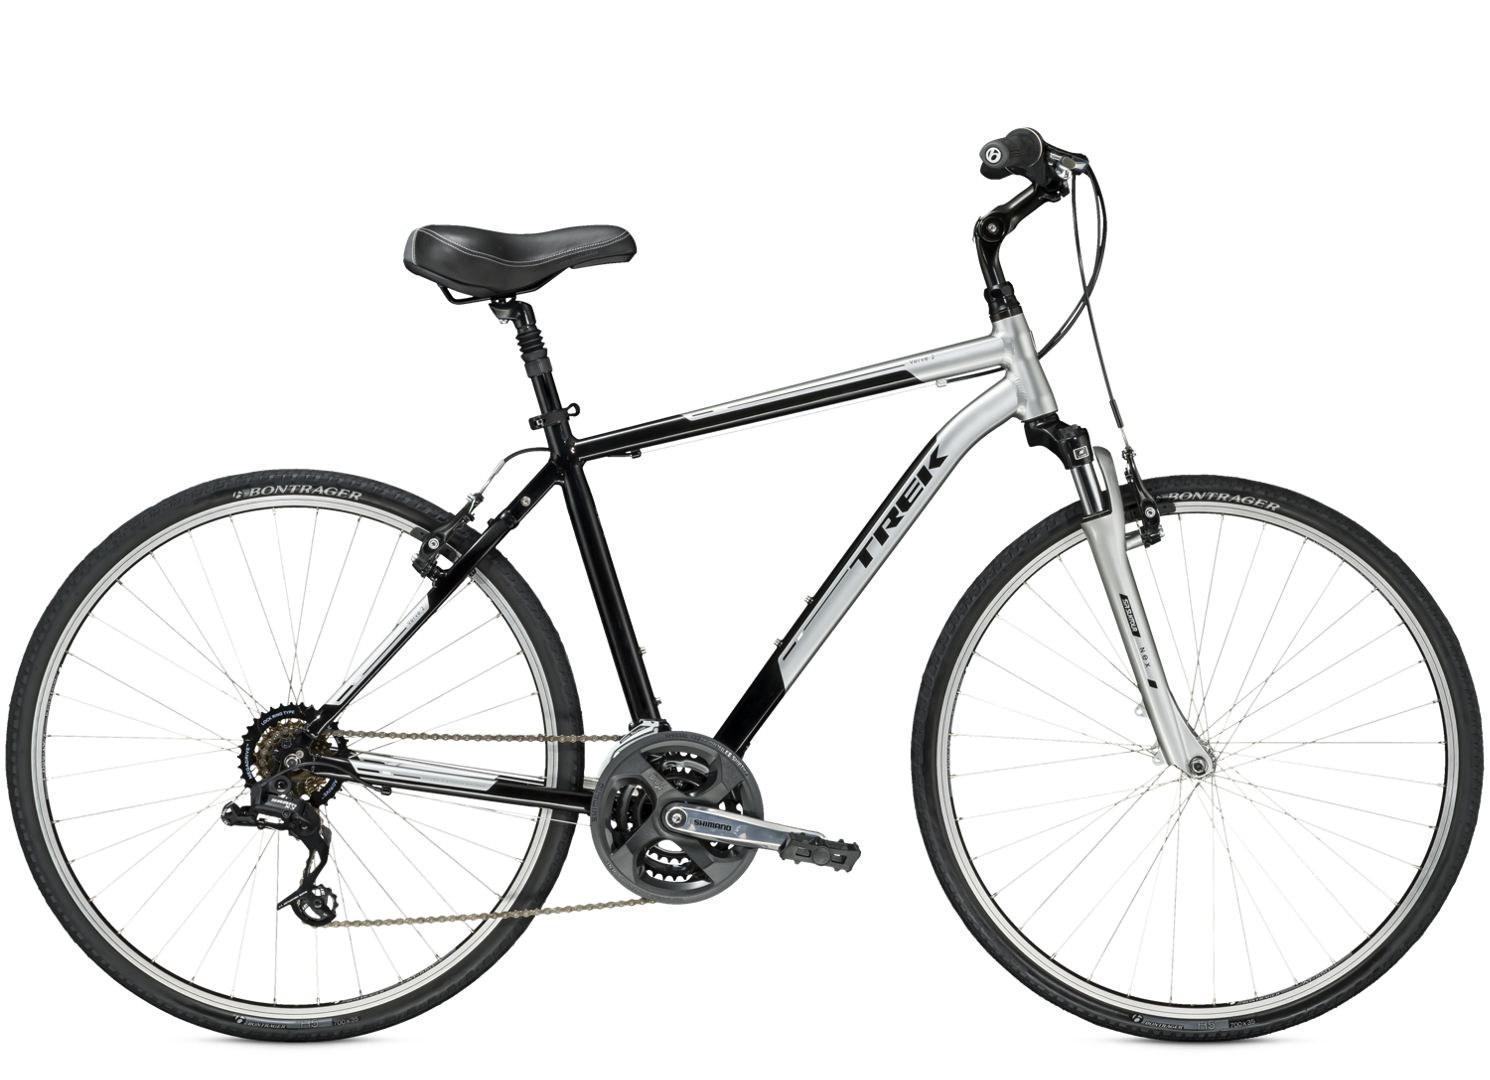 2016 Verve 2 Bike Archive Trek Bicycle